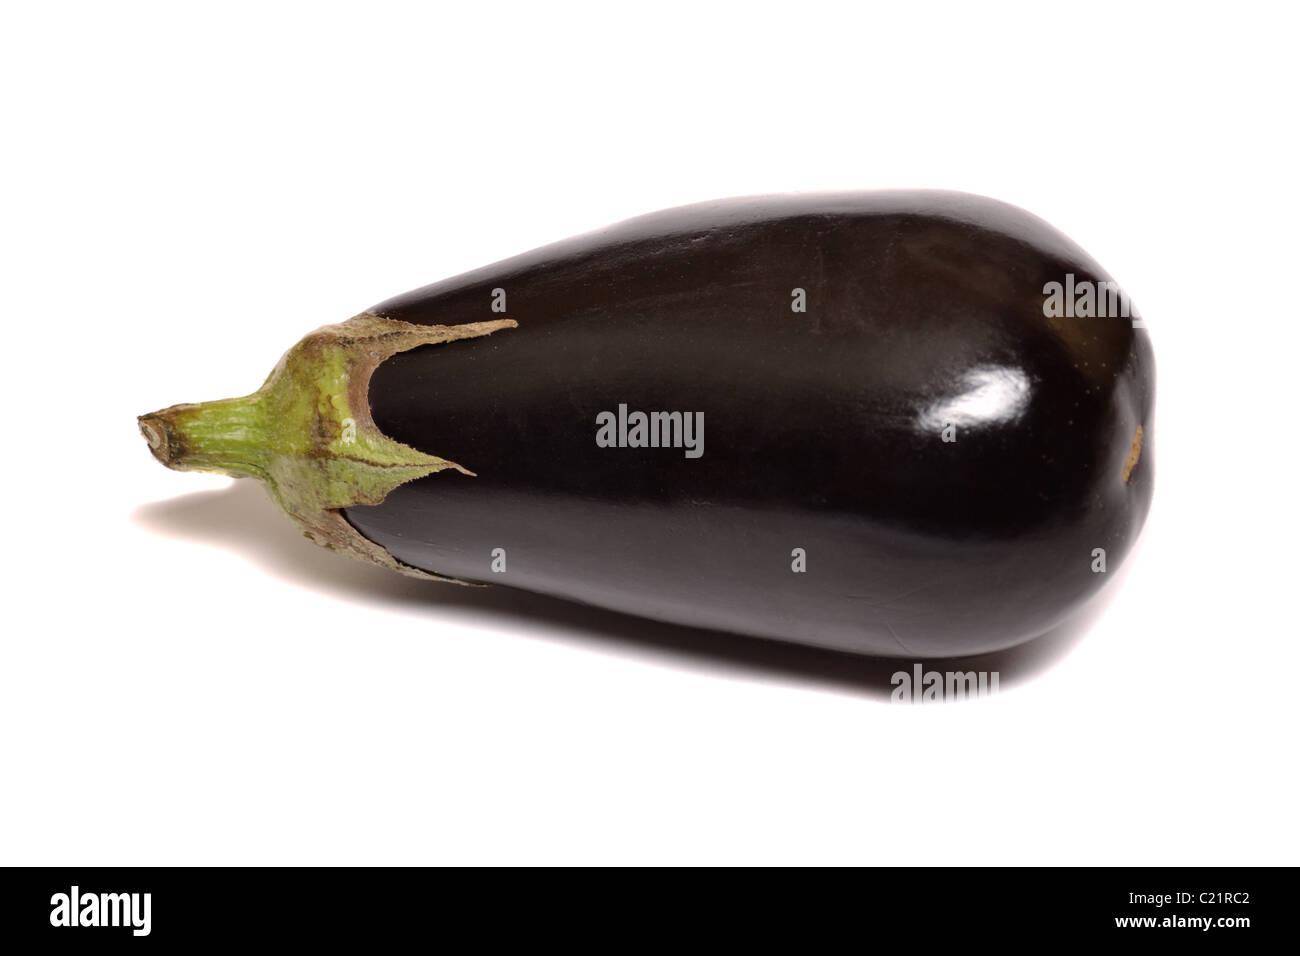 Eggplant isolated on a white background - Stock Image